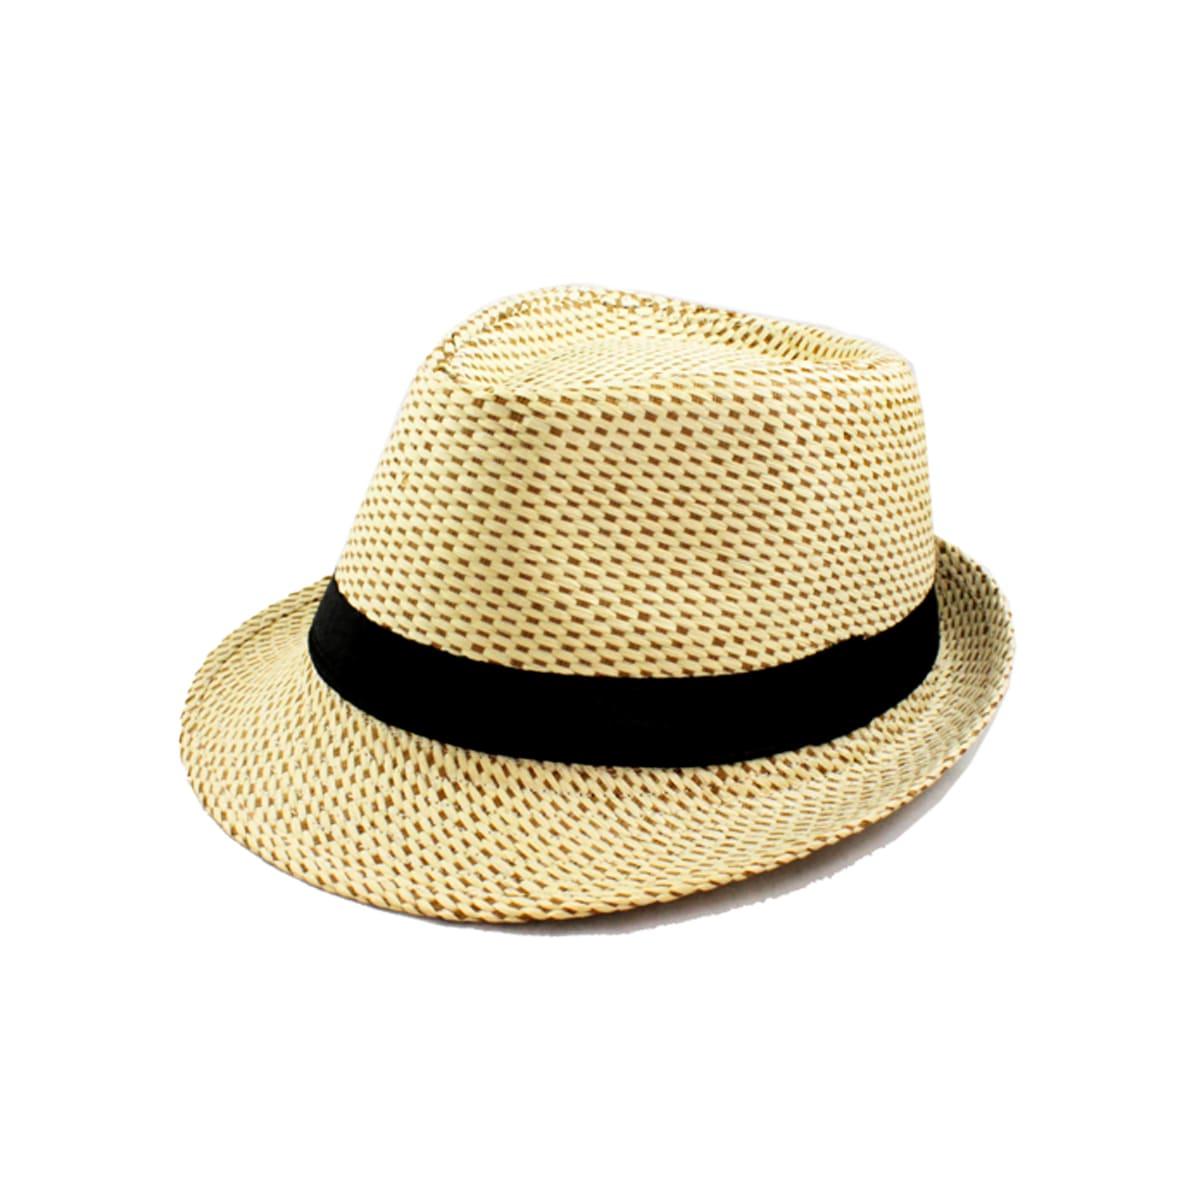 Faddism Unisex Beige Woven Fedora Hat